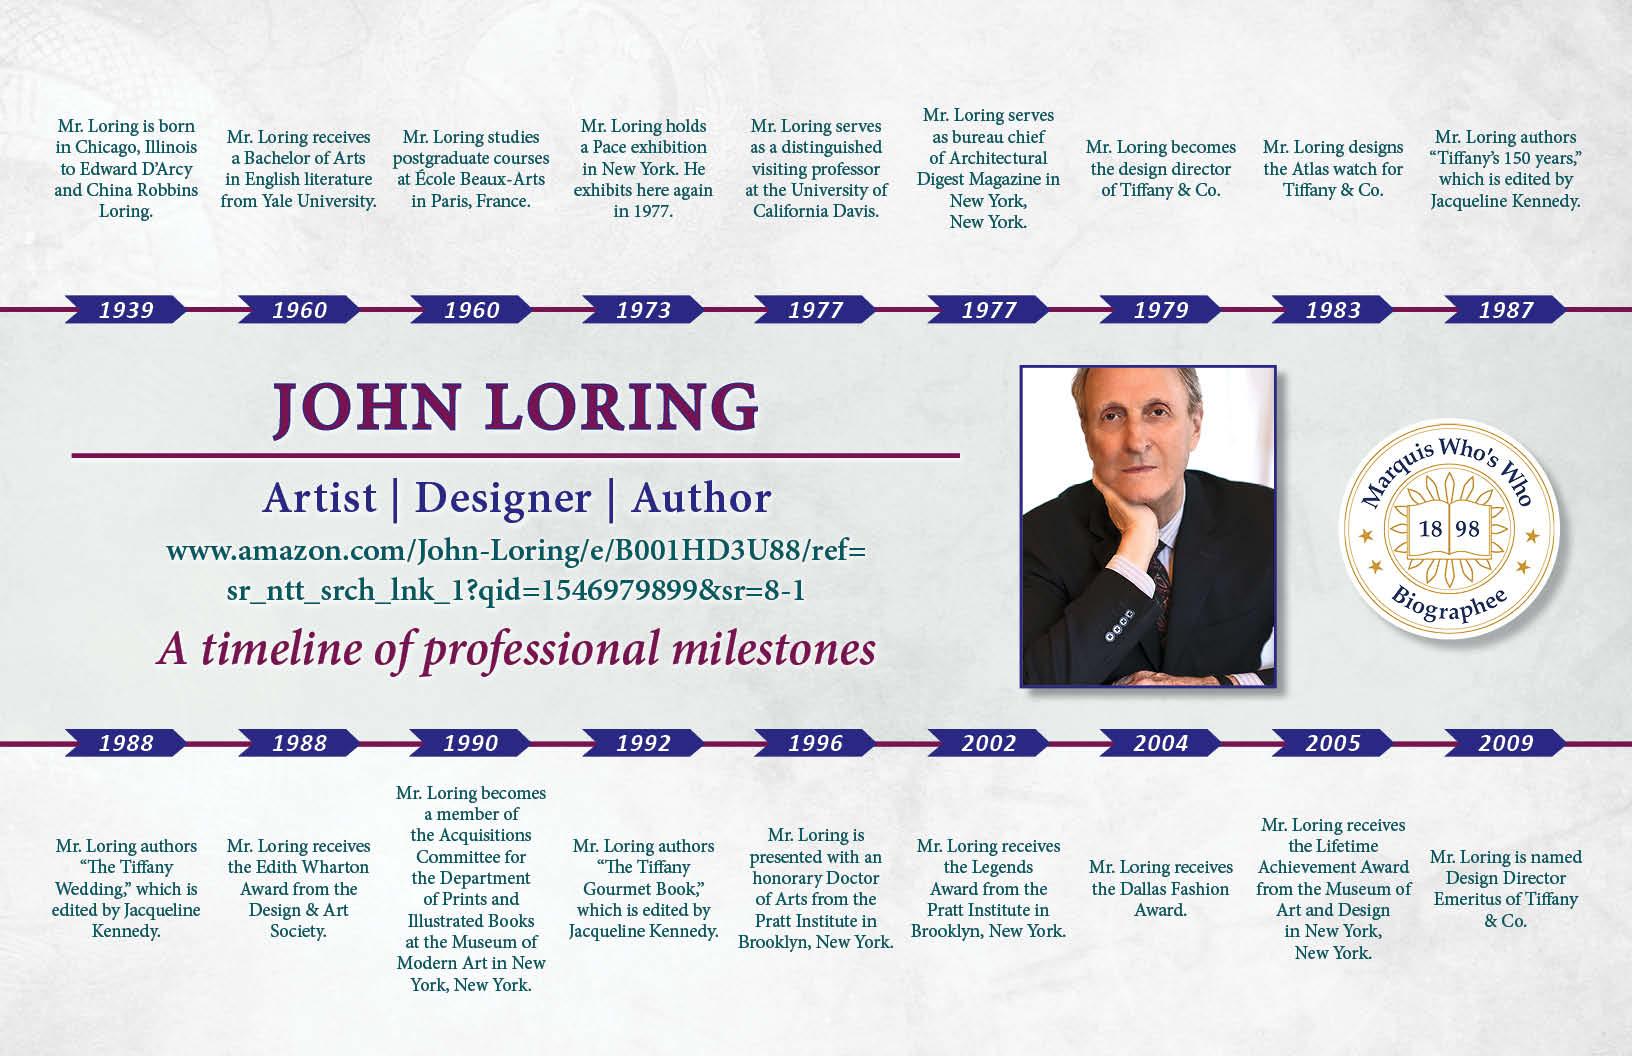 John Loring Professional Milestones